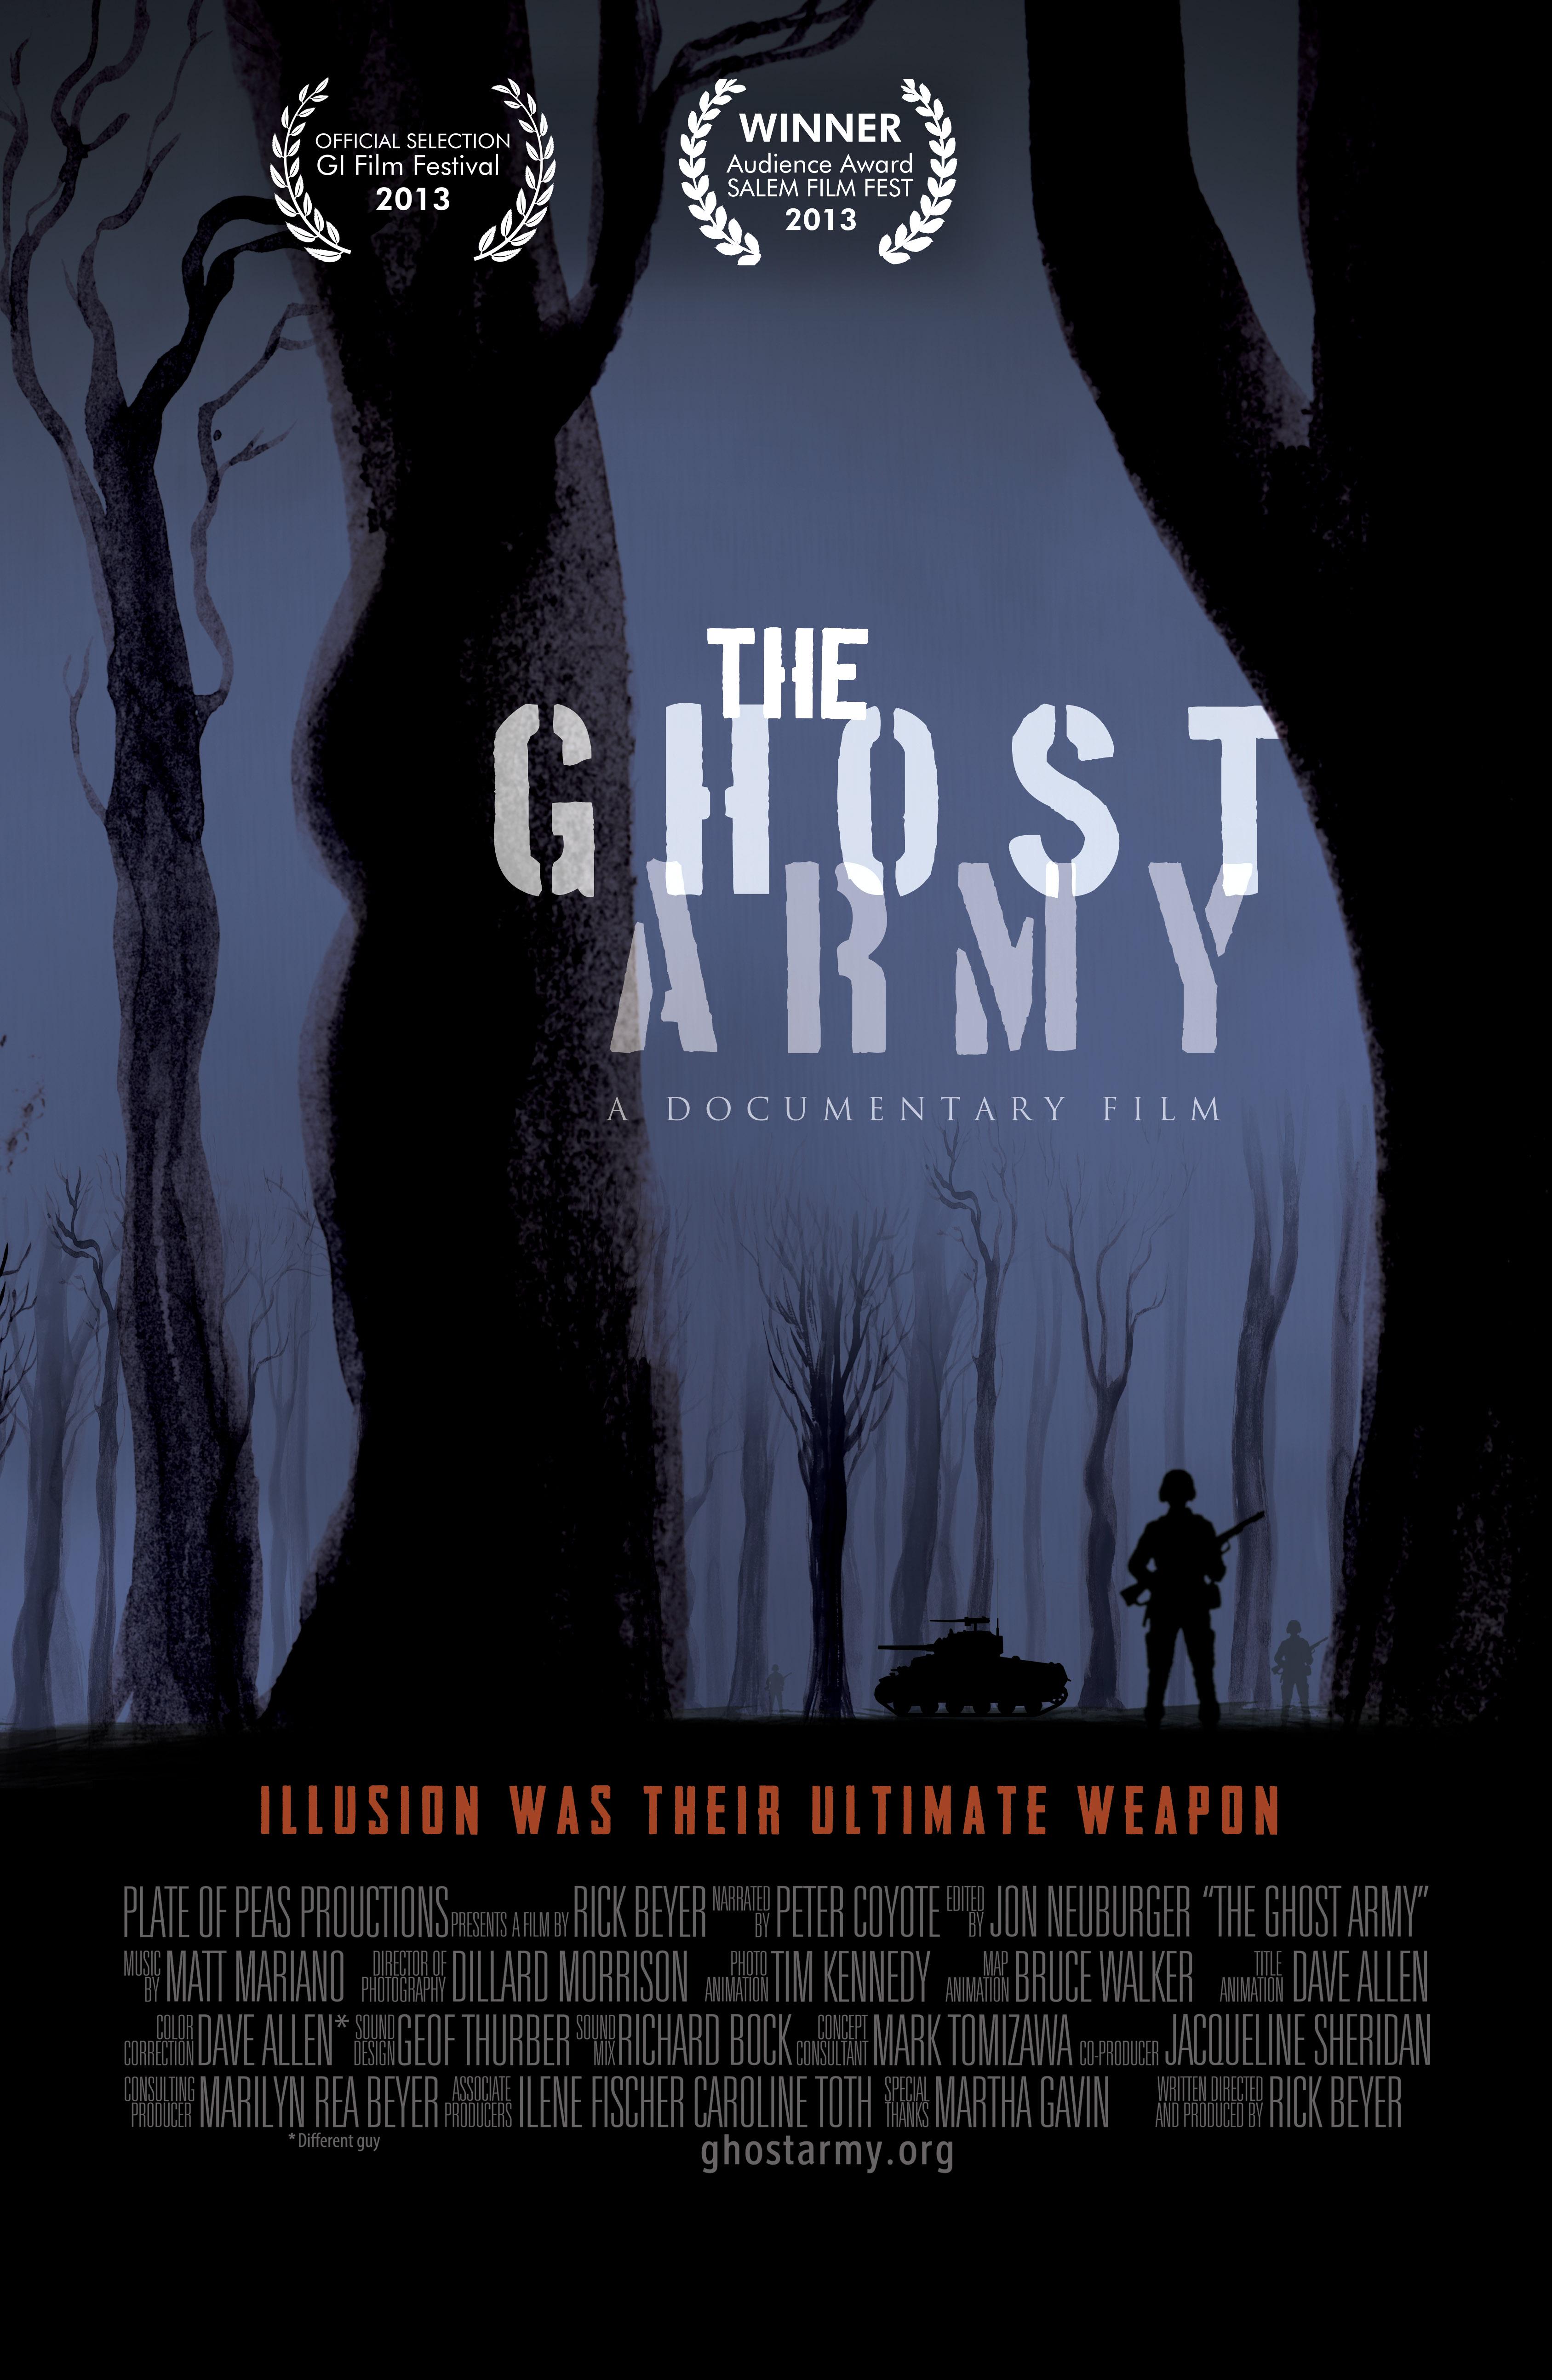 u0026#39;The Ghost Armyu0026#39;: Story Of World War II Deception Airs ...